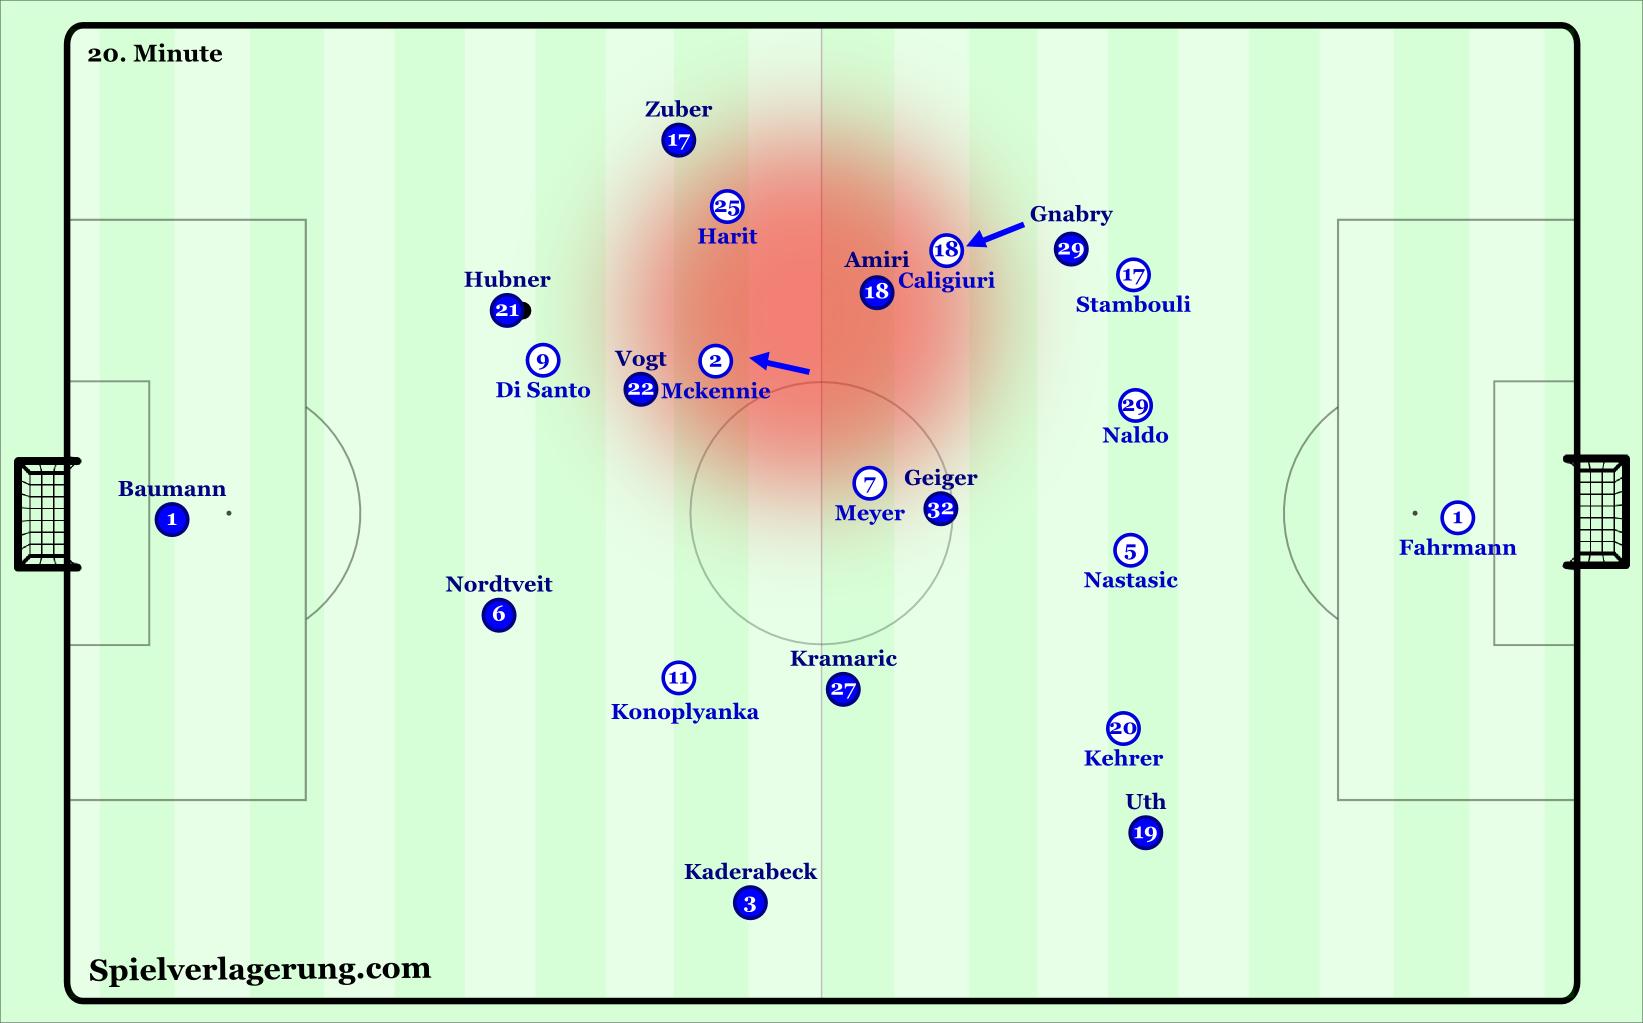 Schalke pressing